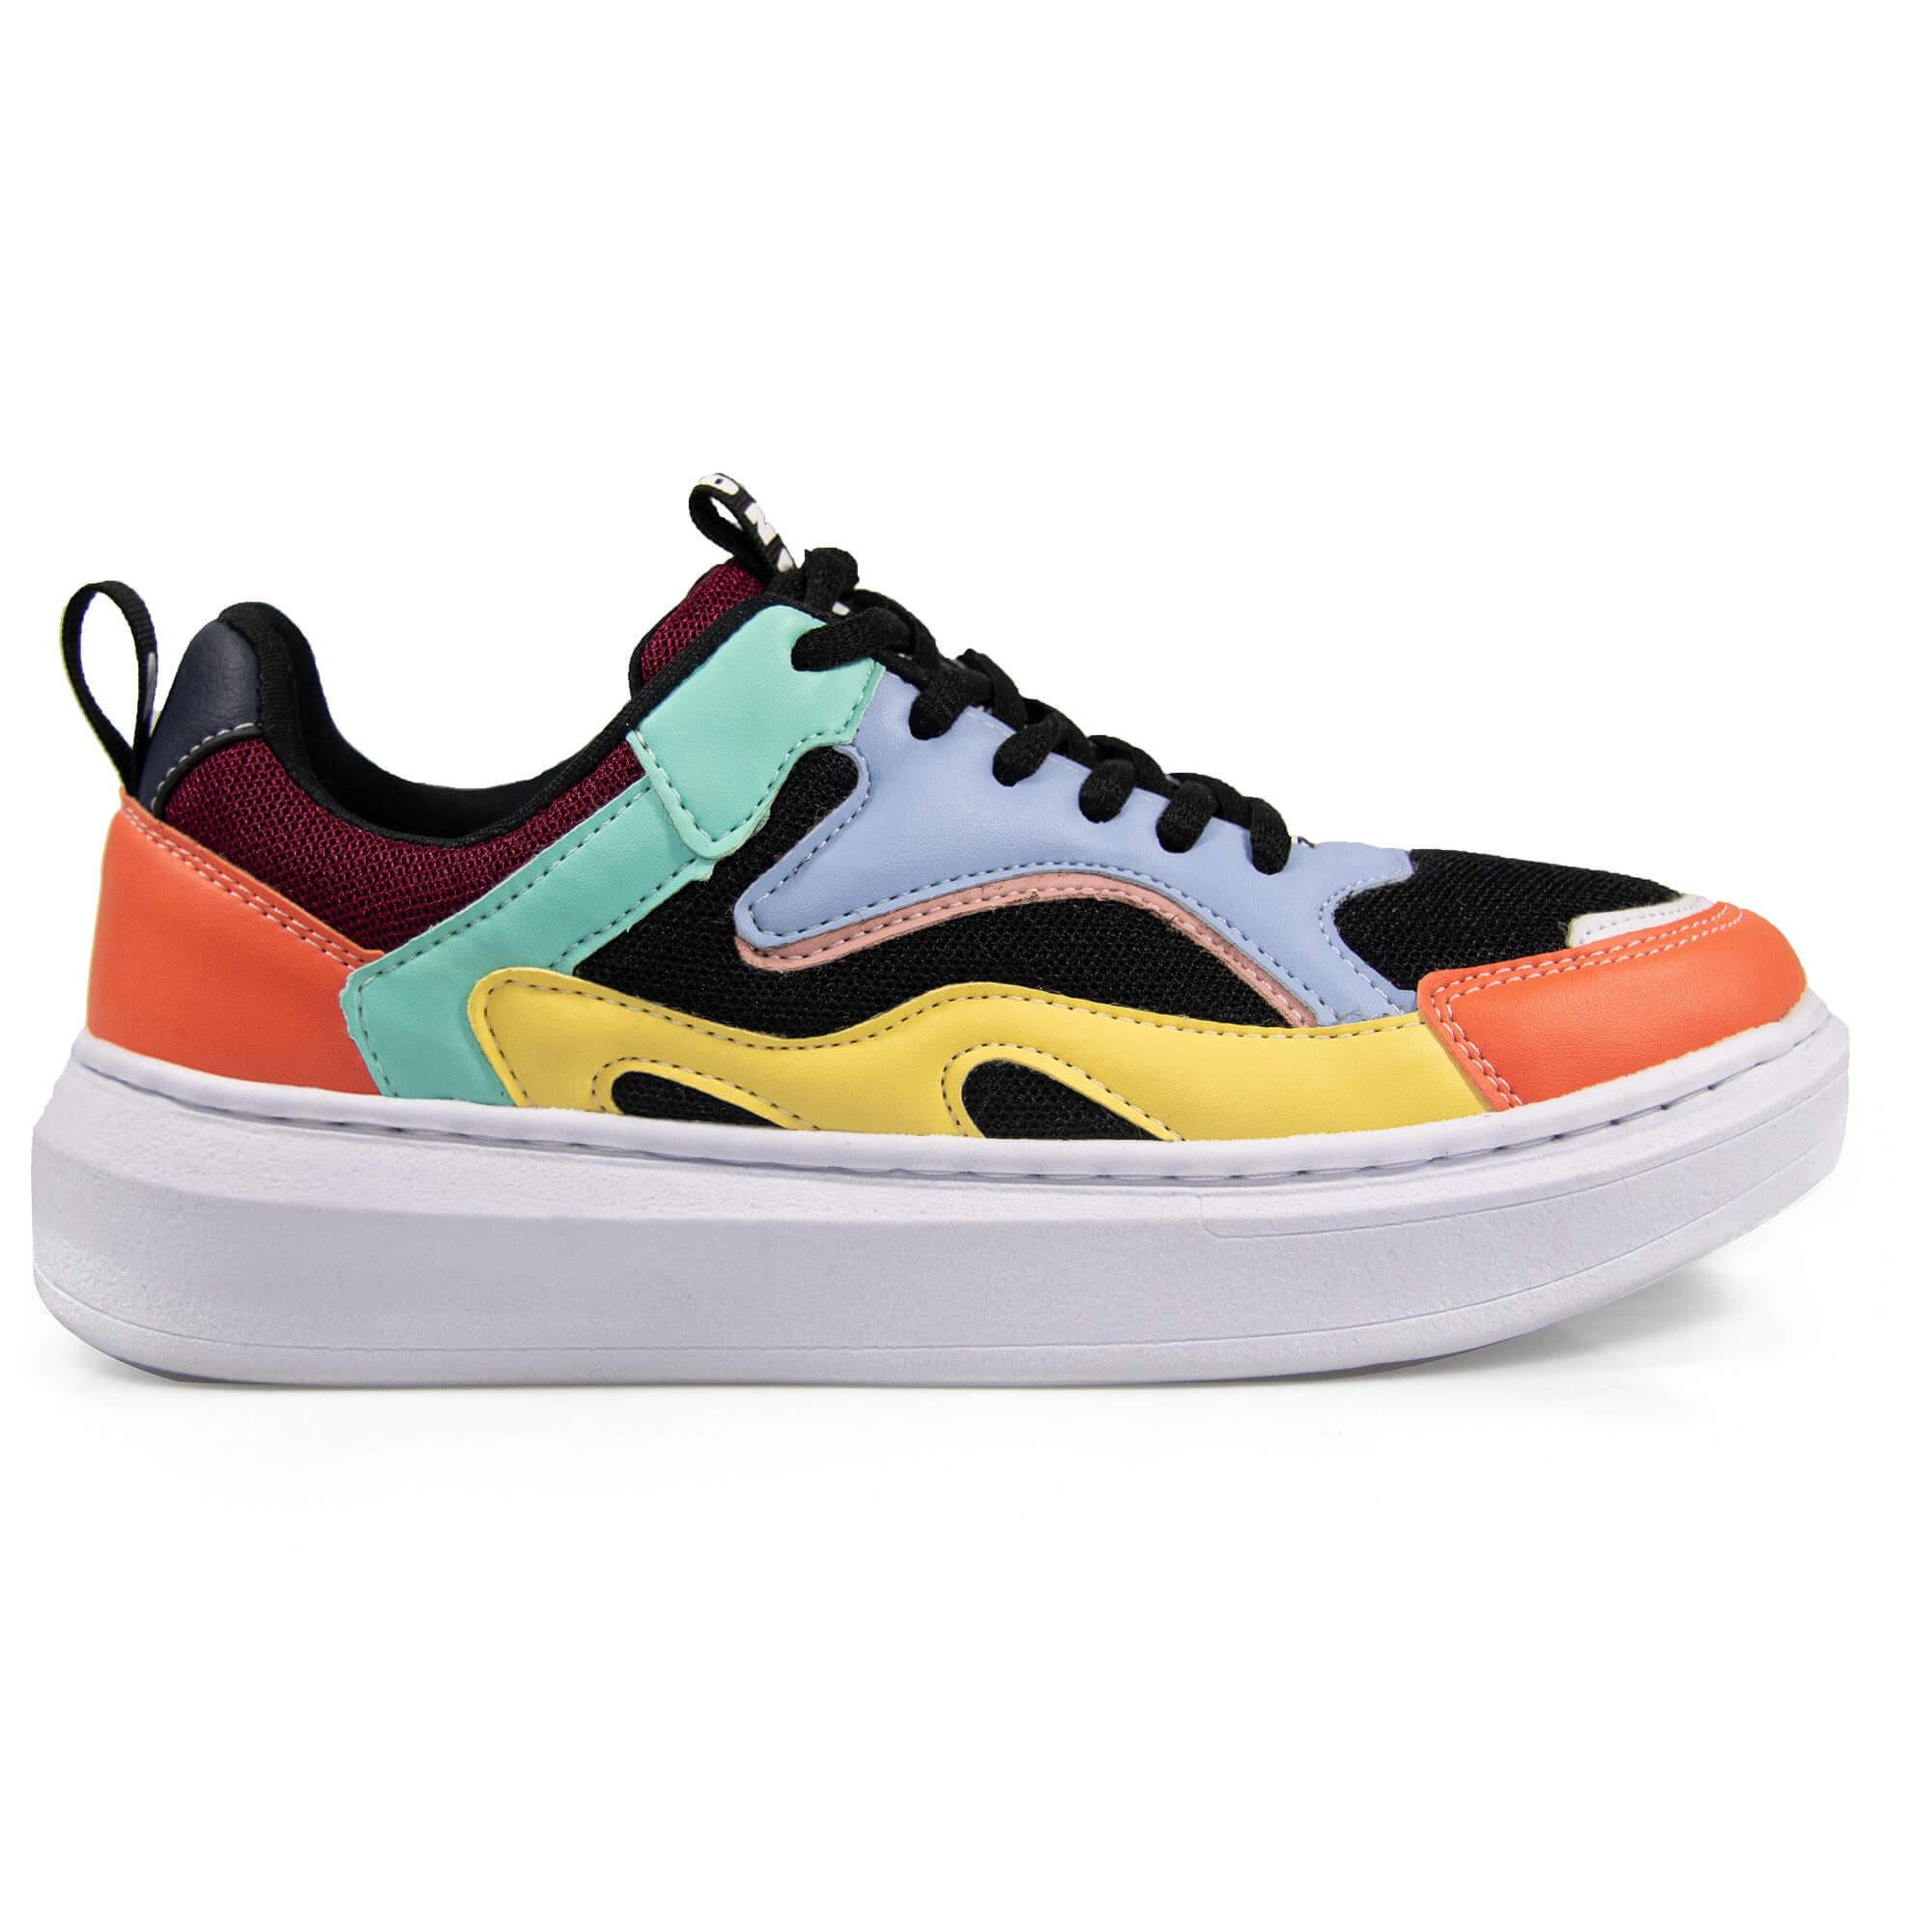 Tênis Vegano Shoes Fashion Vegan Evolution Color